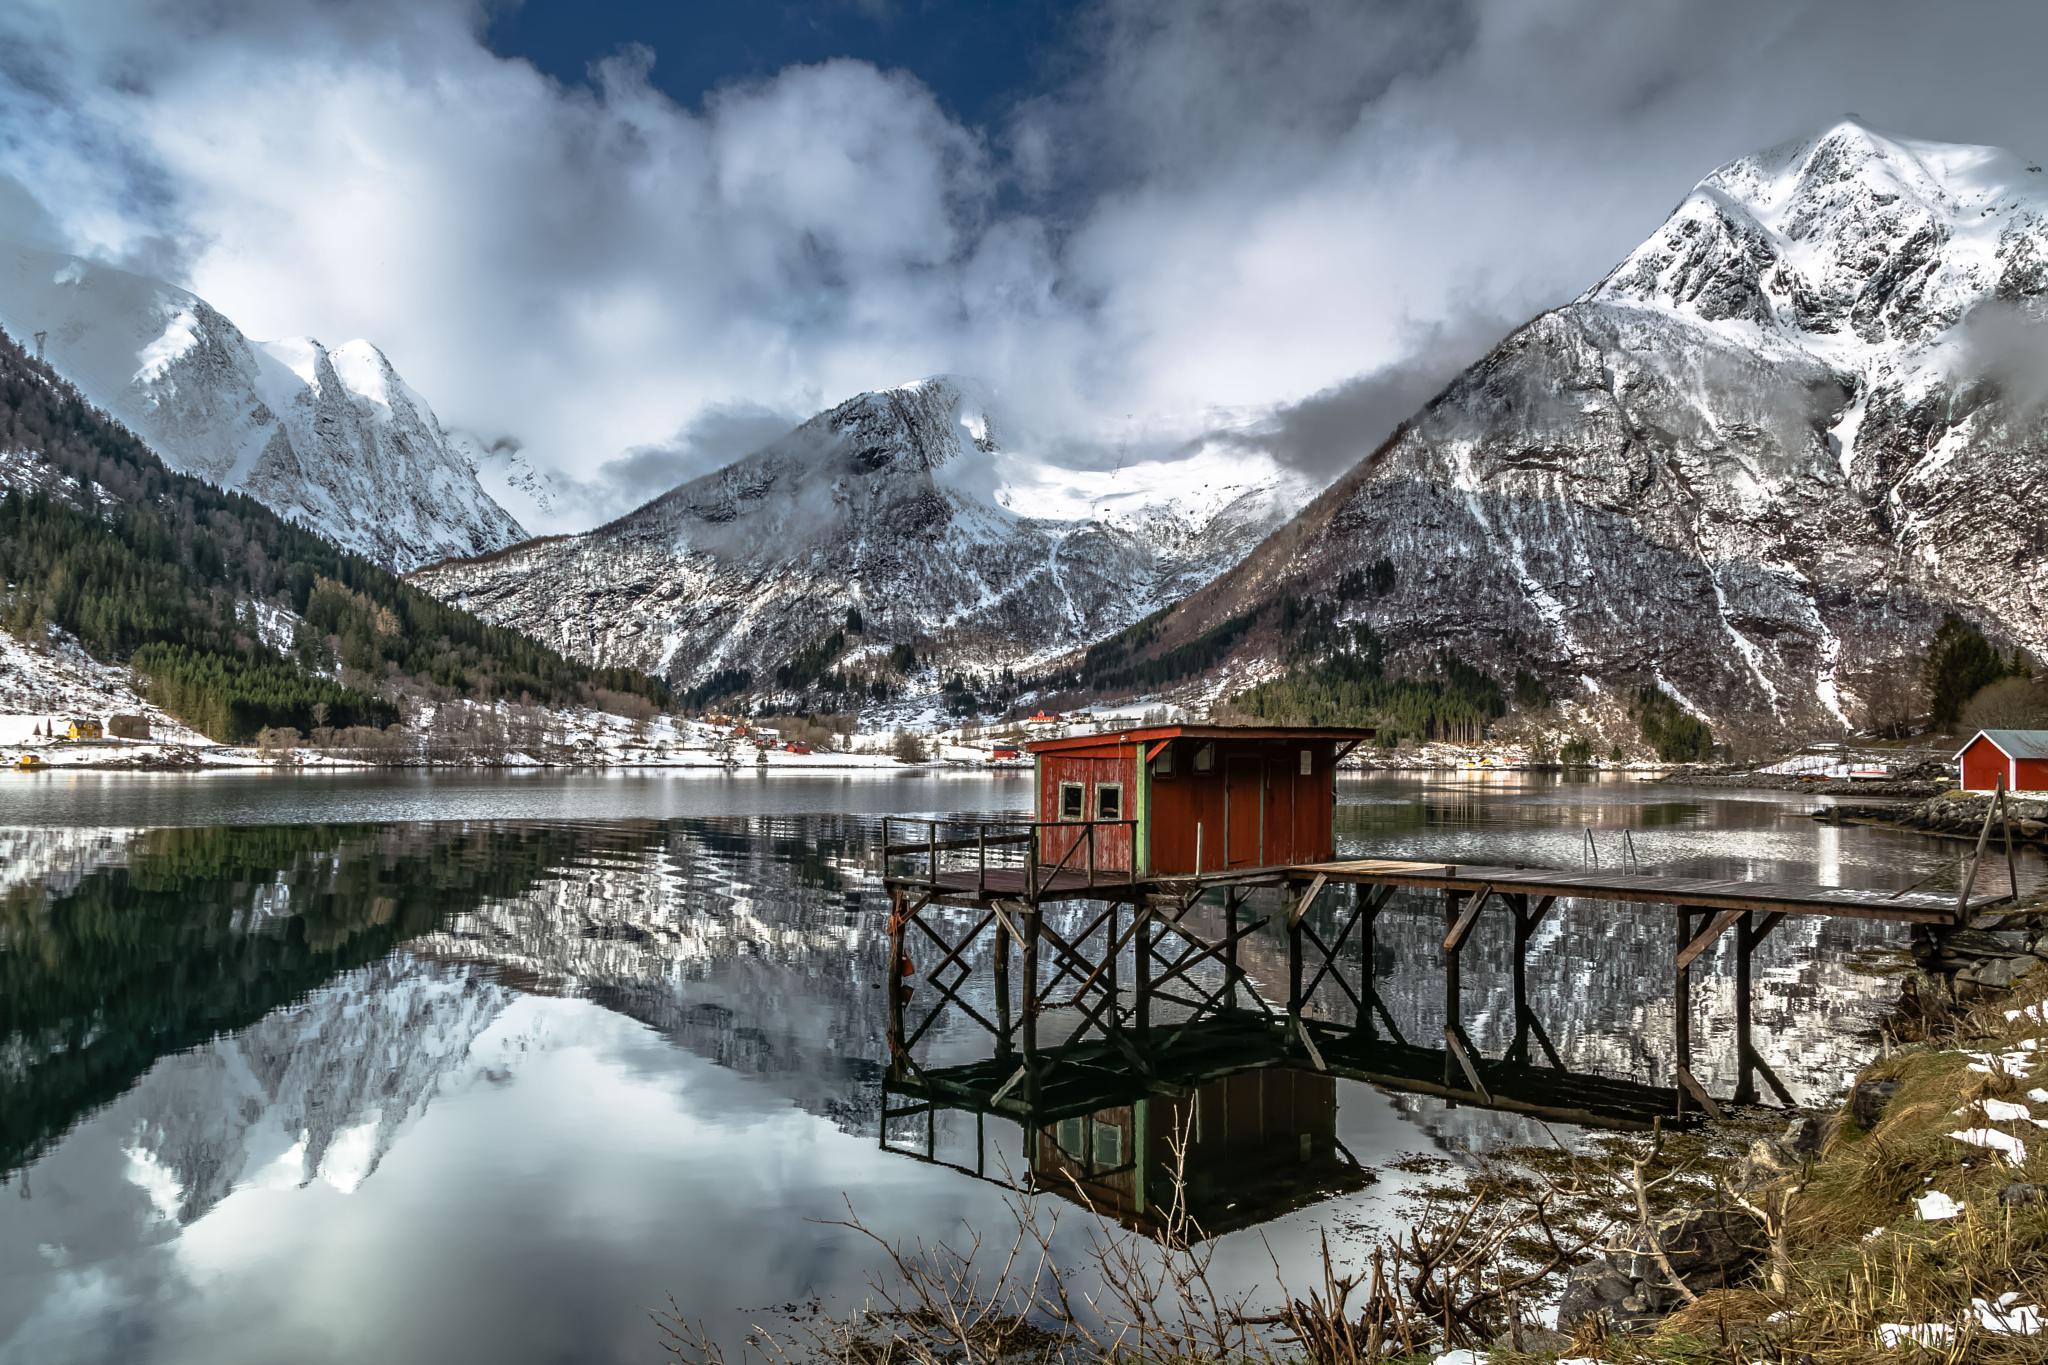 Morning Reflection, Balestrand, Norway by EuropeTrotter